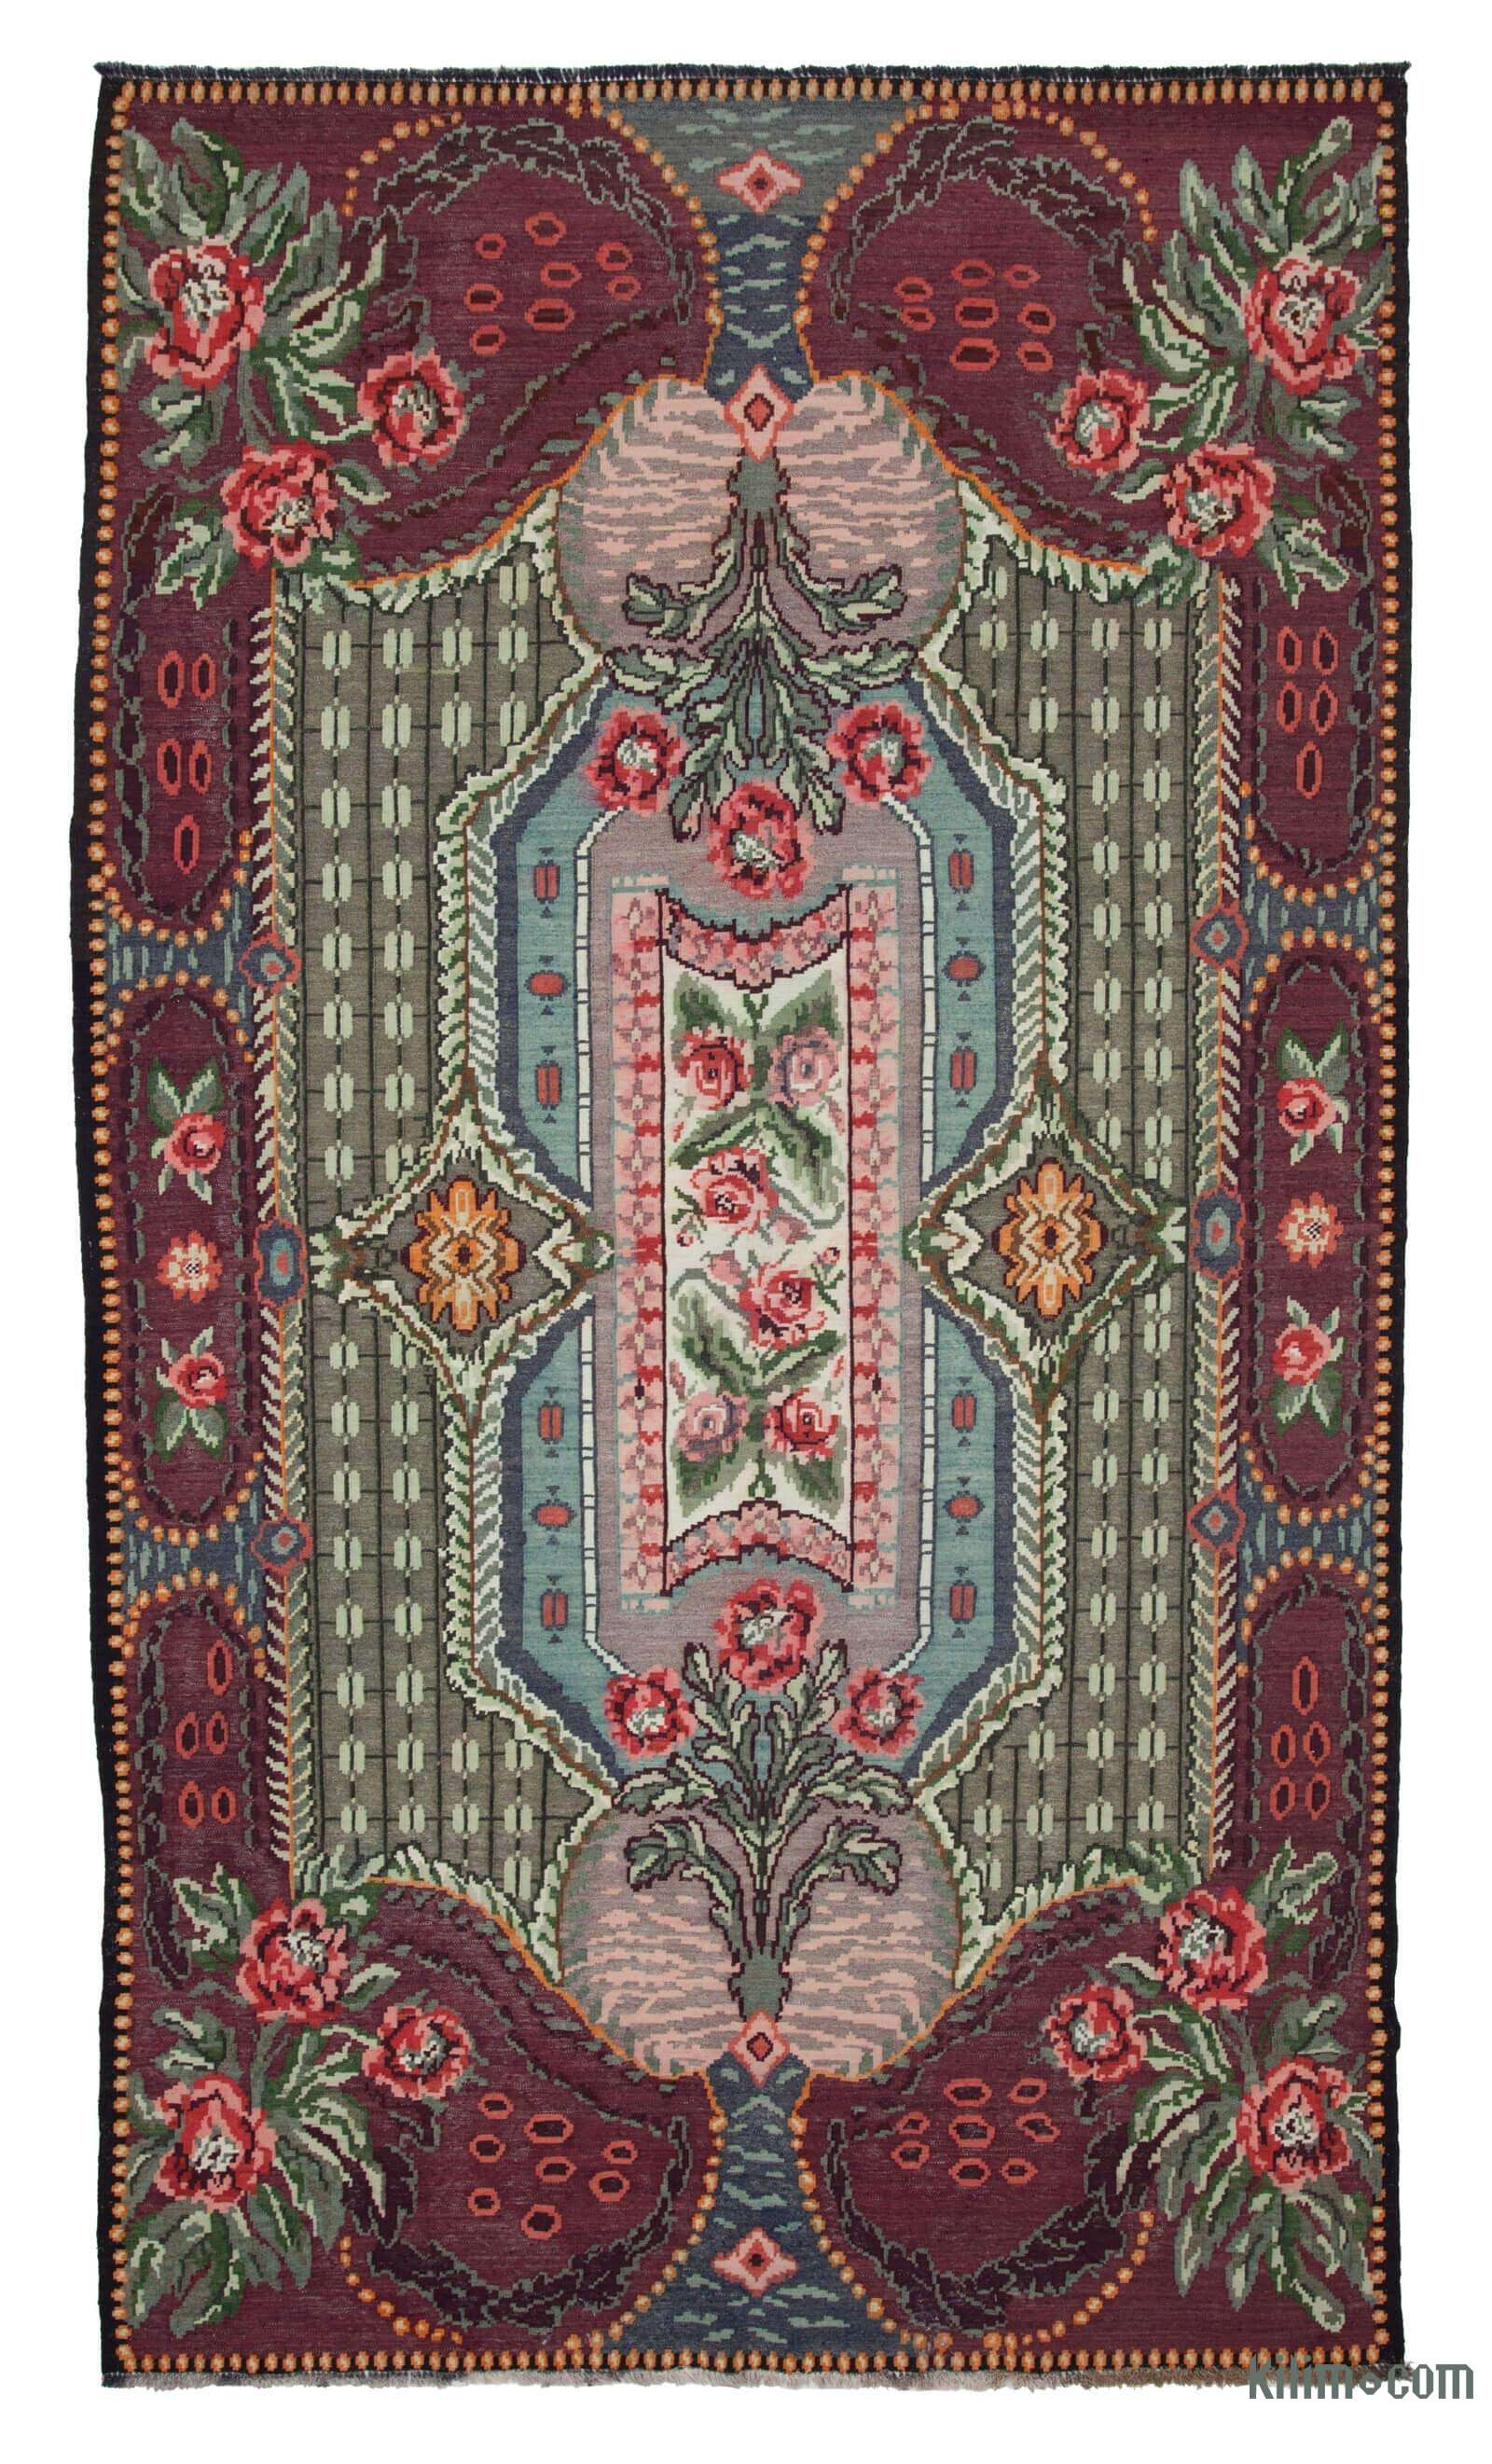 Handwoven Moldovan Kilim Area Rug